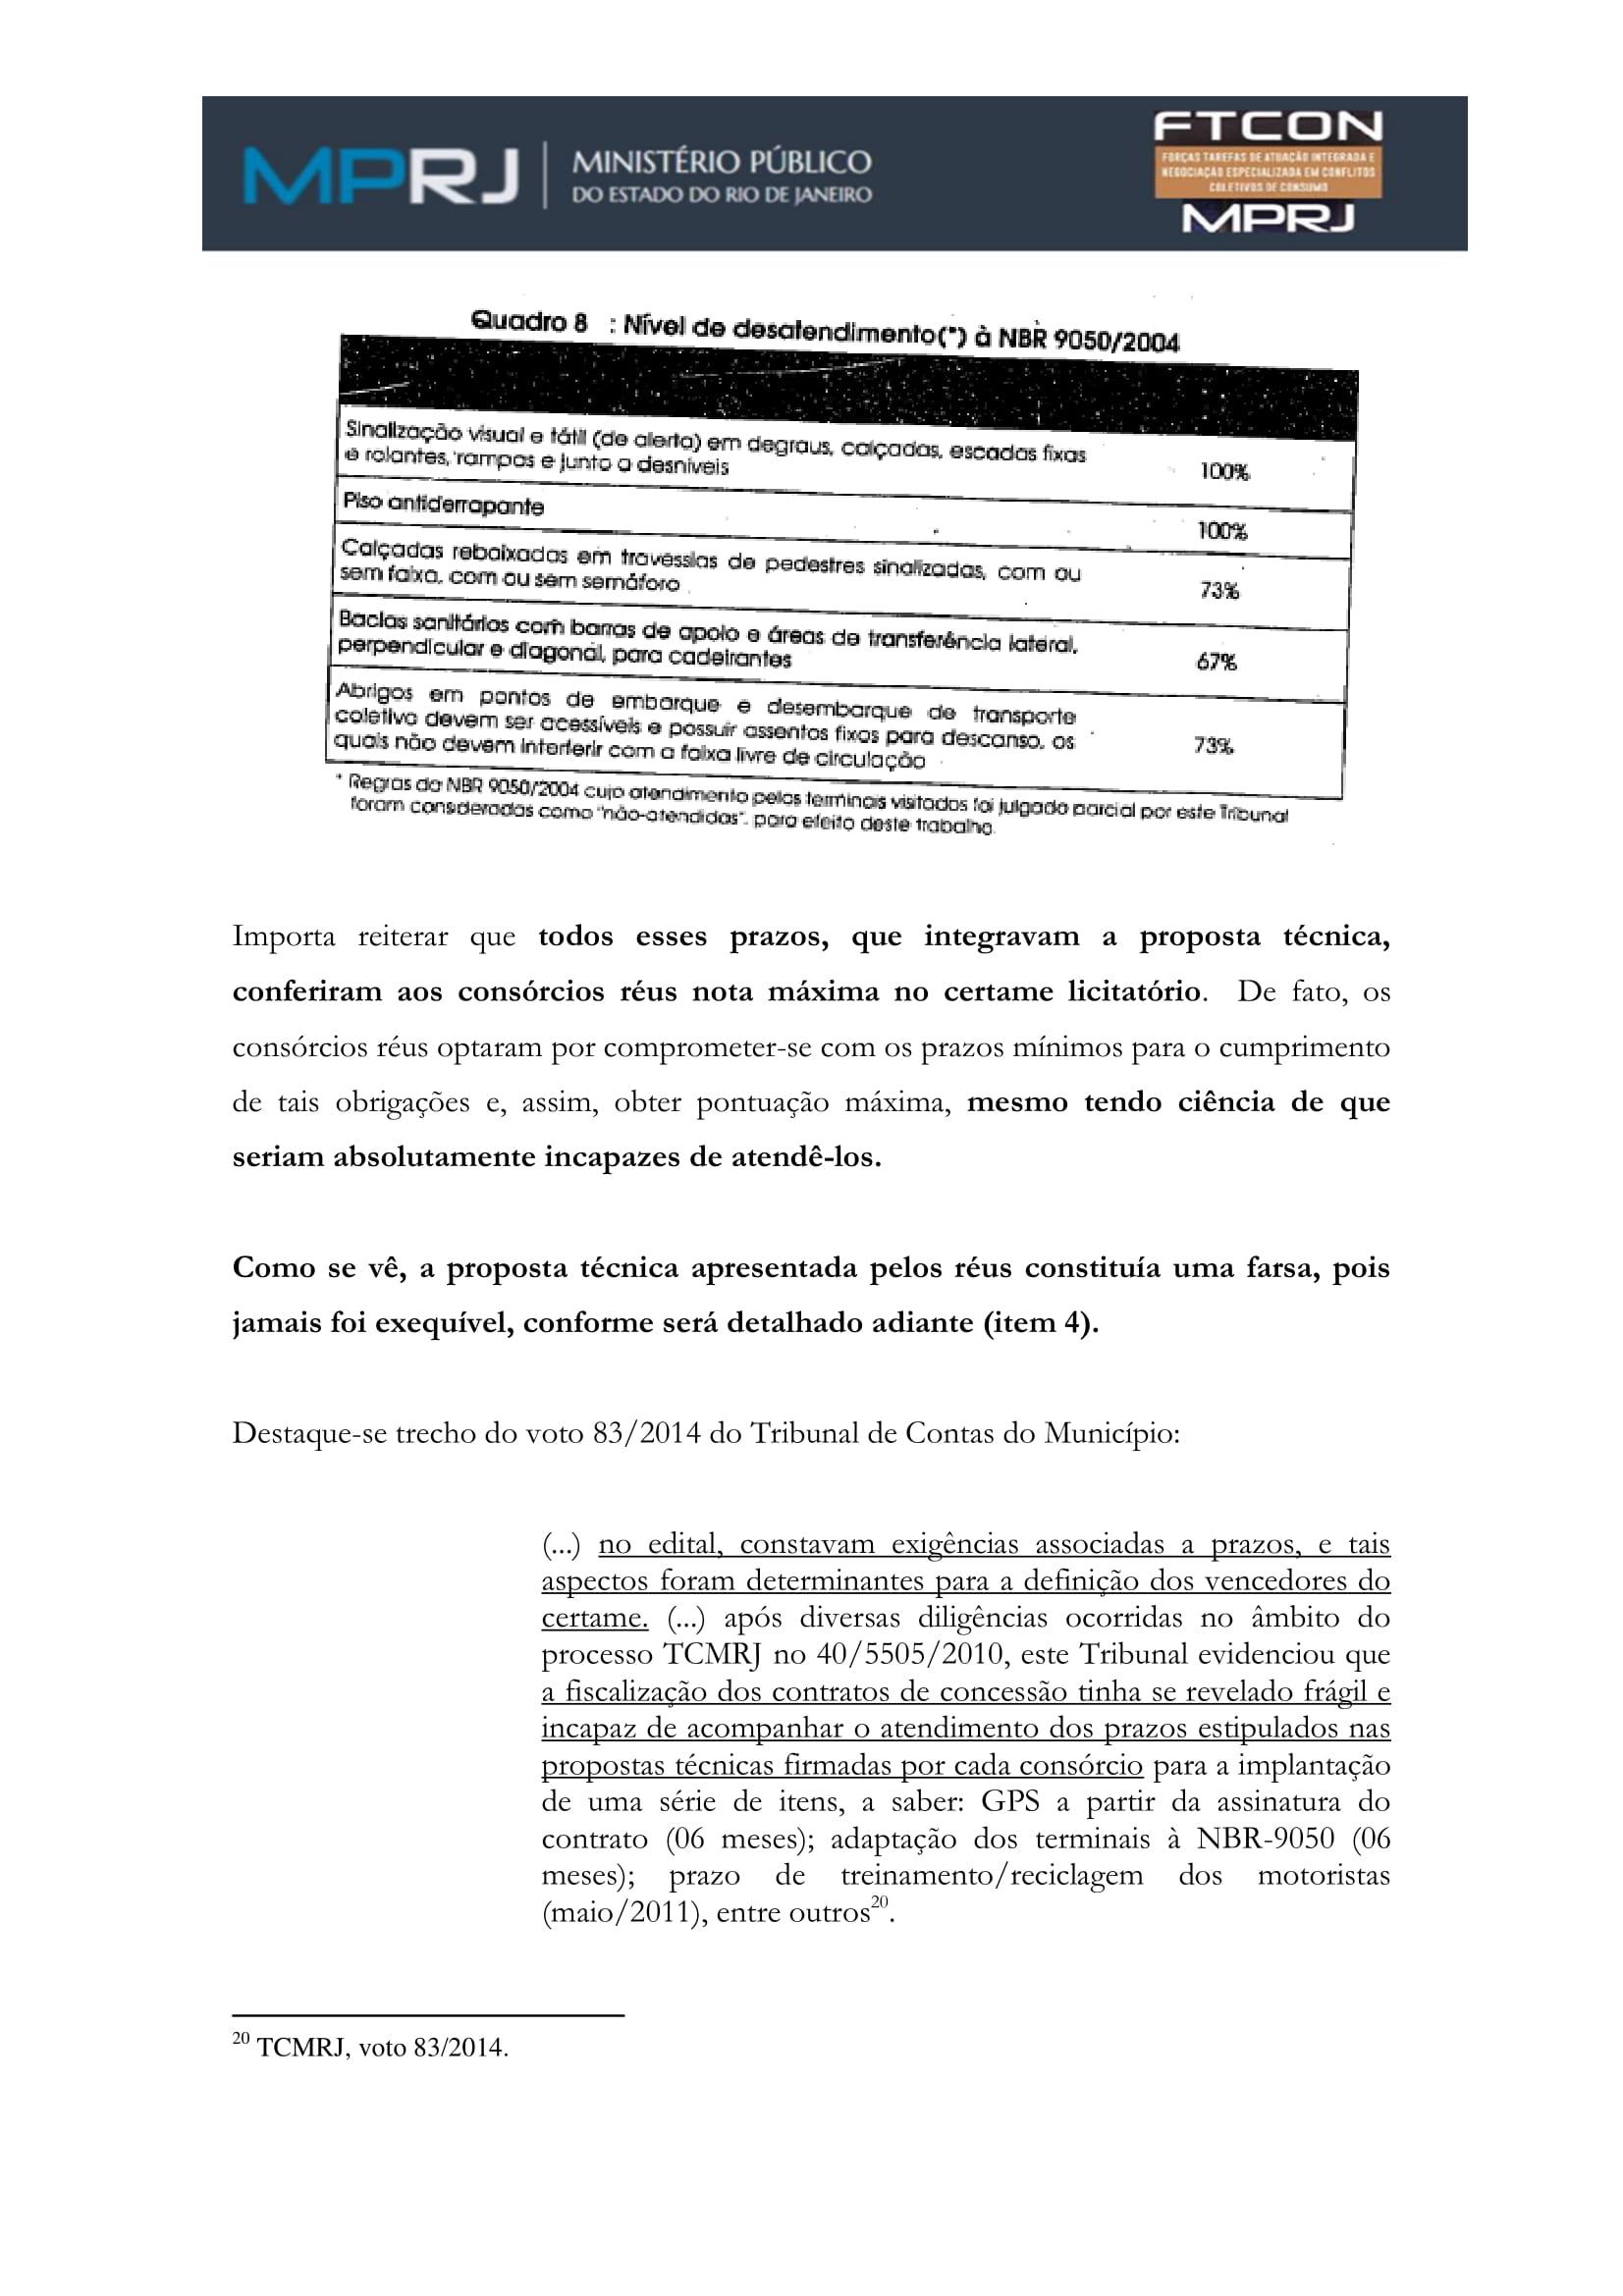 acp_caducidade_onibus_dr_rt-020